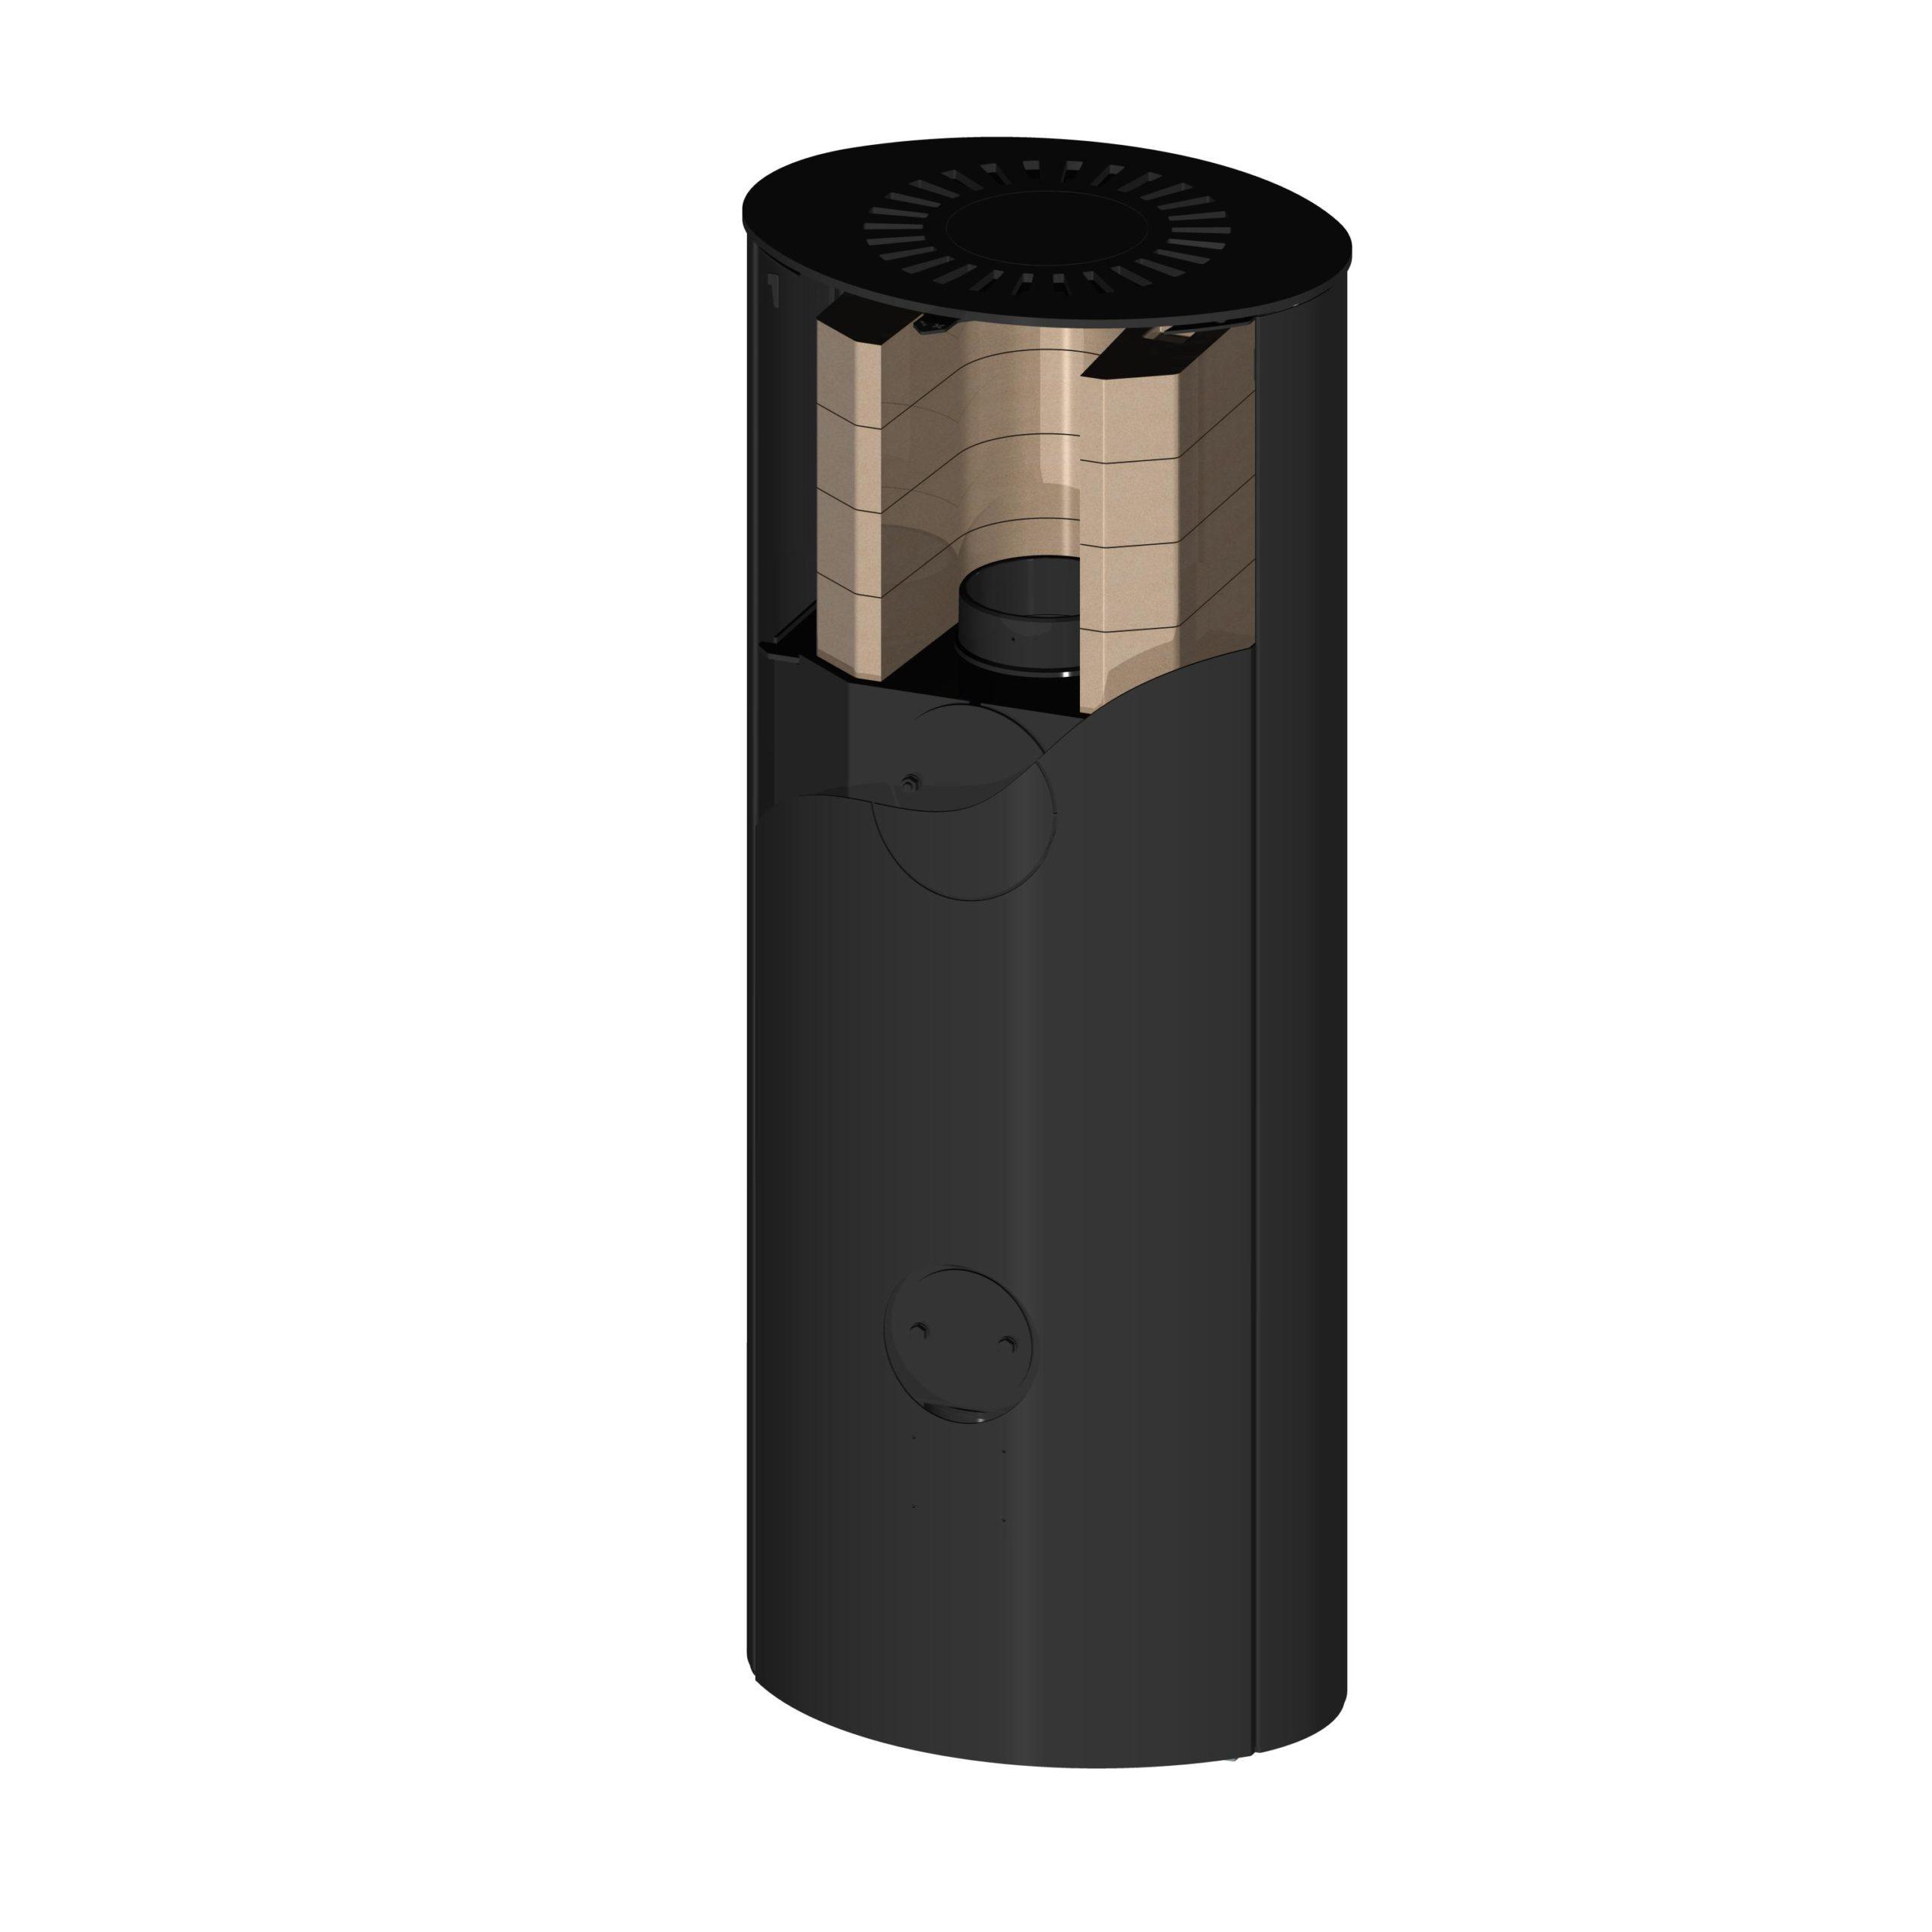 Akumulacni prvky pro krbova kamna EVORA AKUM 01 – 04